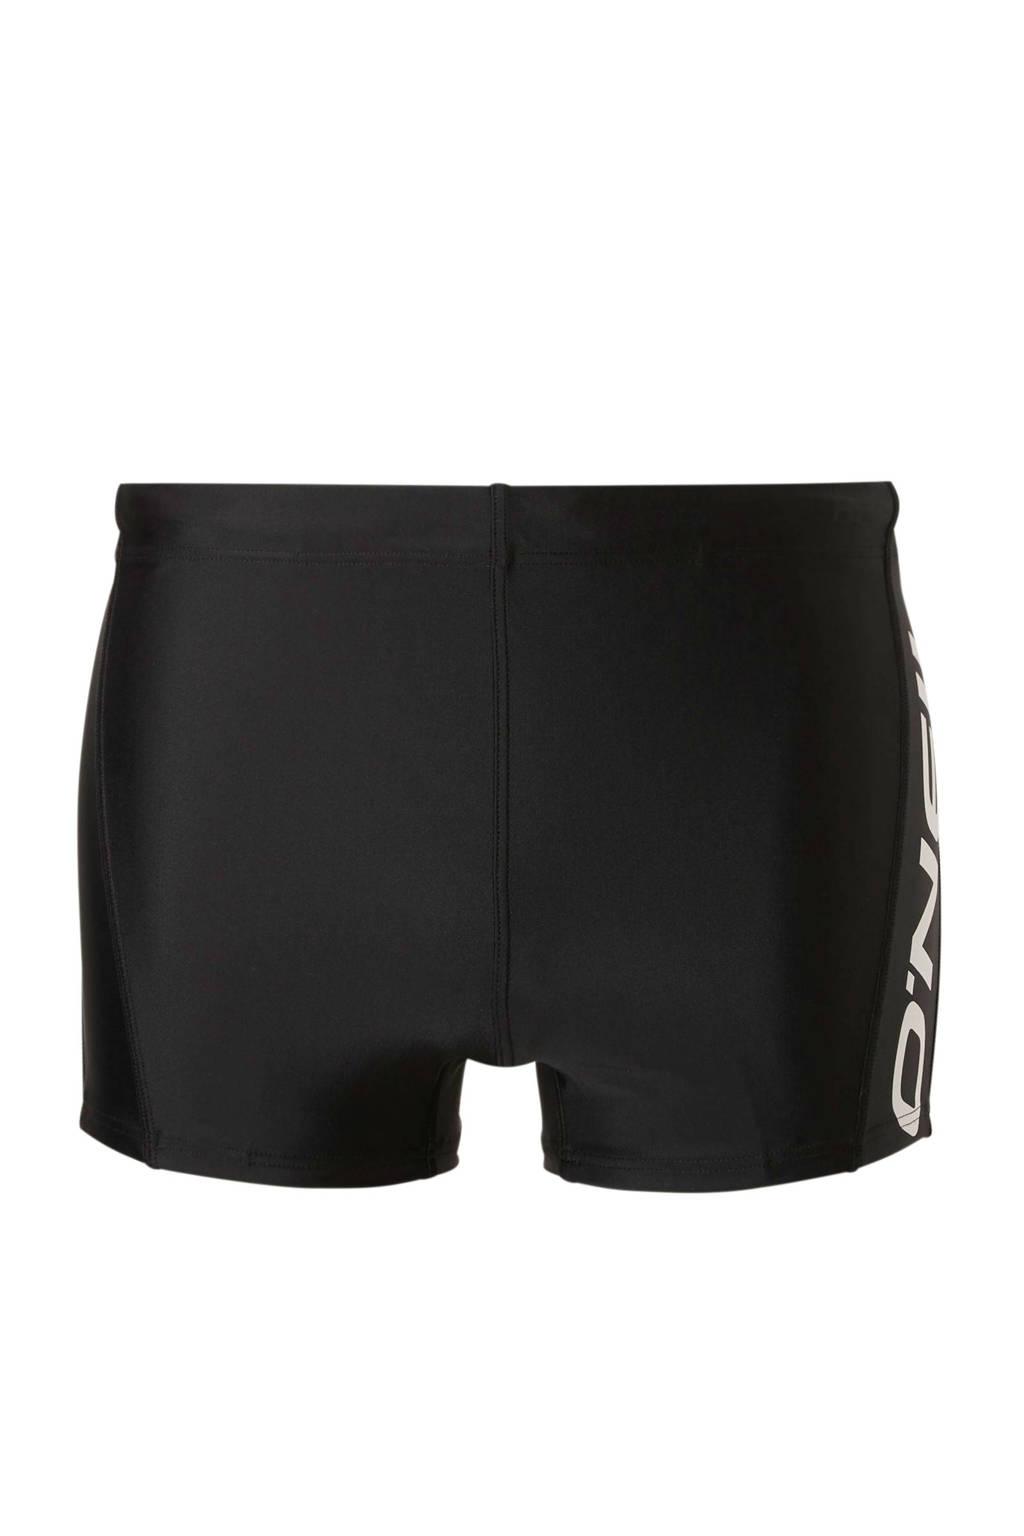 O'Neill zwemboxer met logo zwart, Zwart/wit